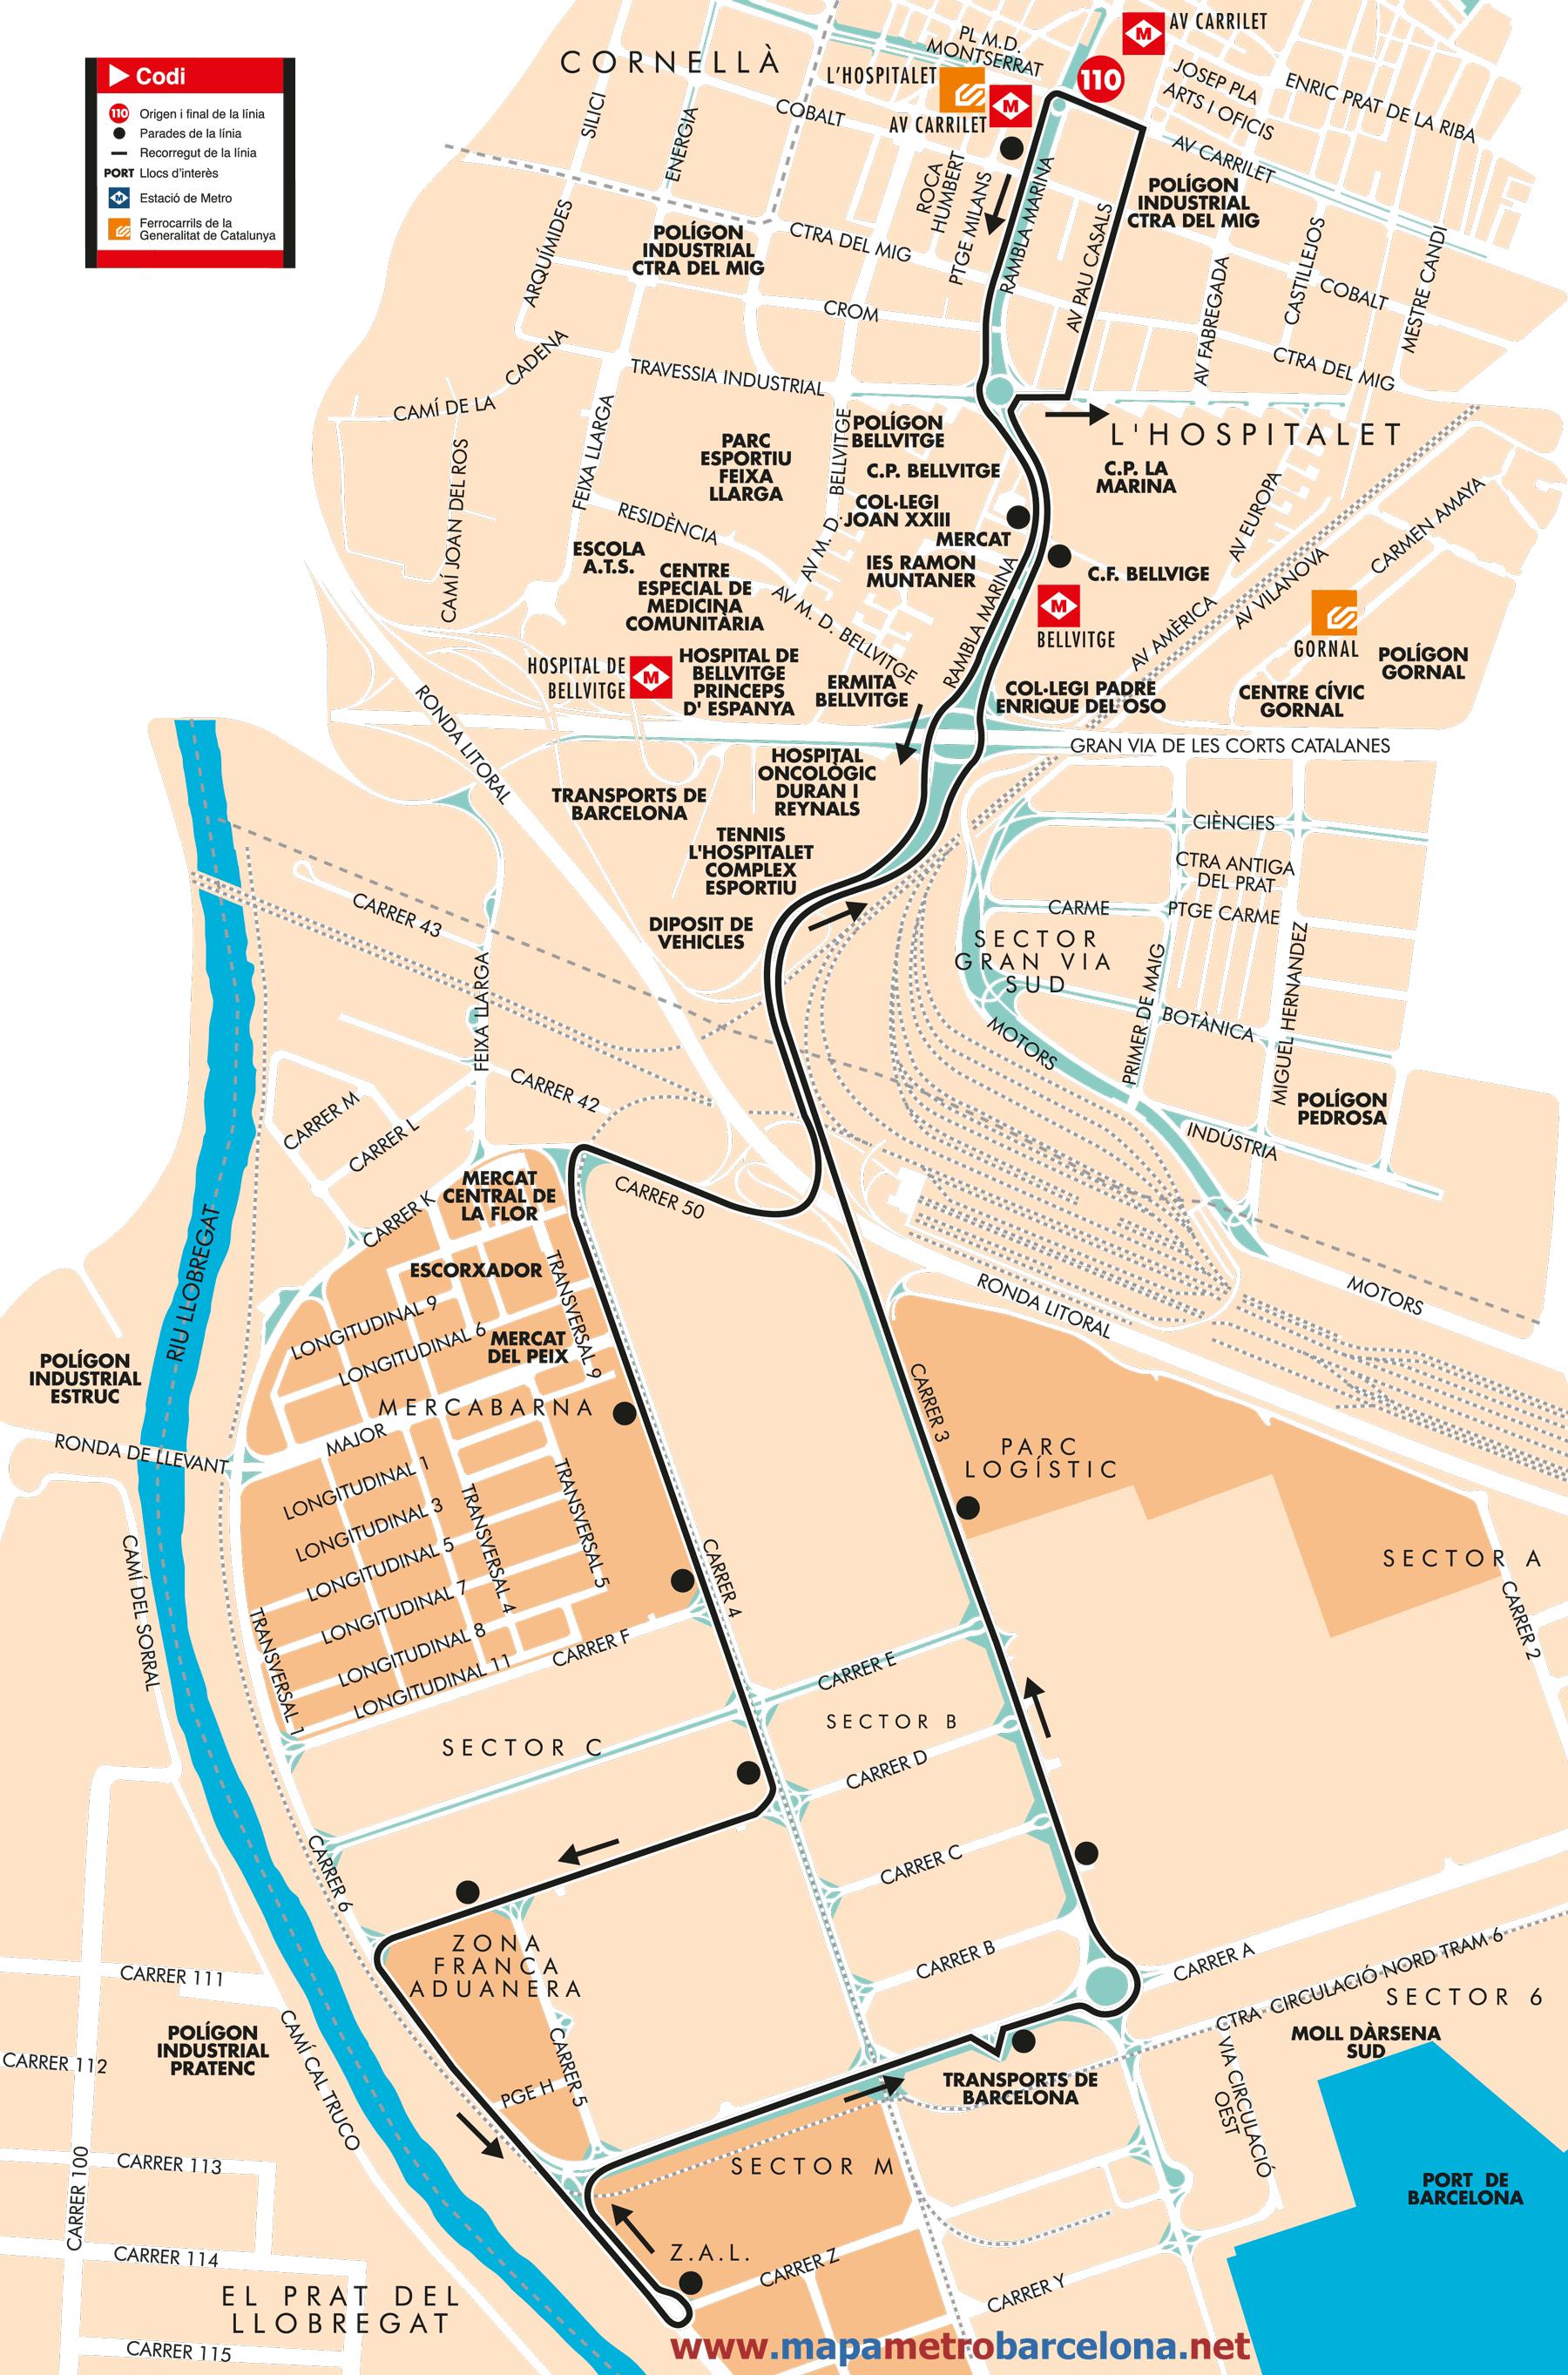 Bus l nea 110 metro carrilet pol gon industrial zona for Linea barcelona